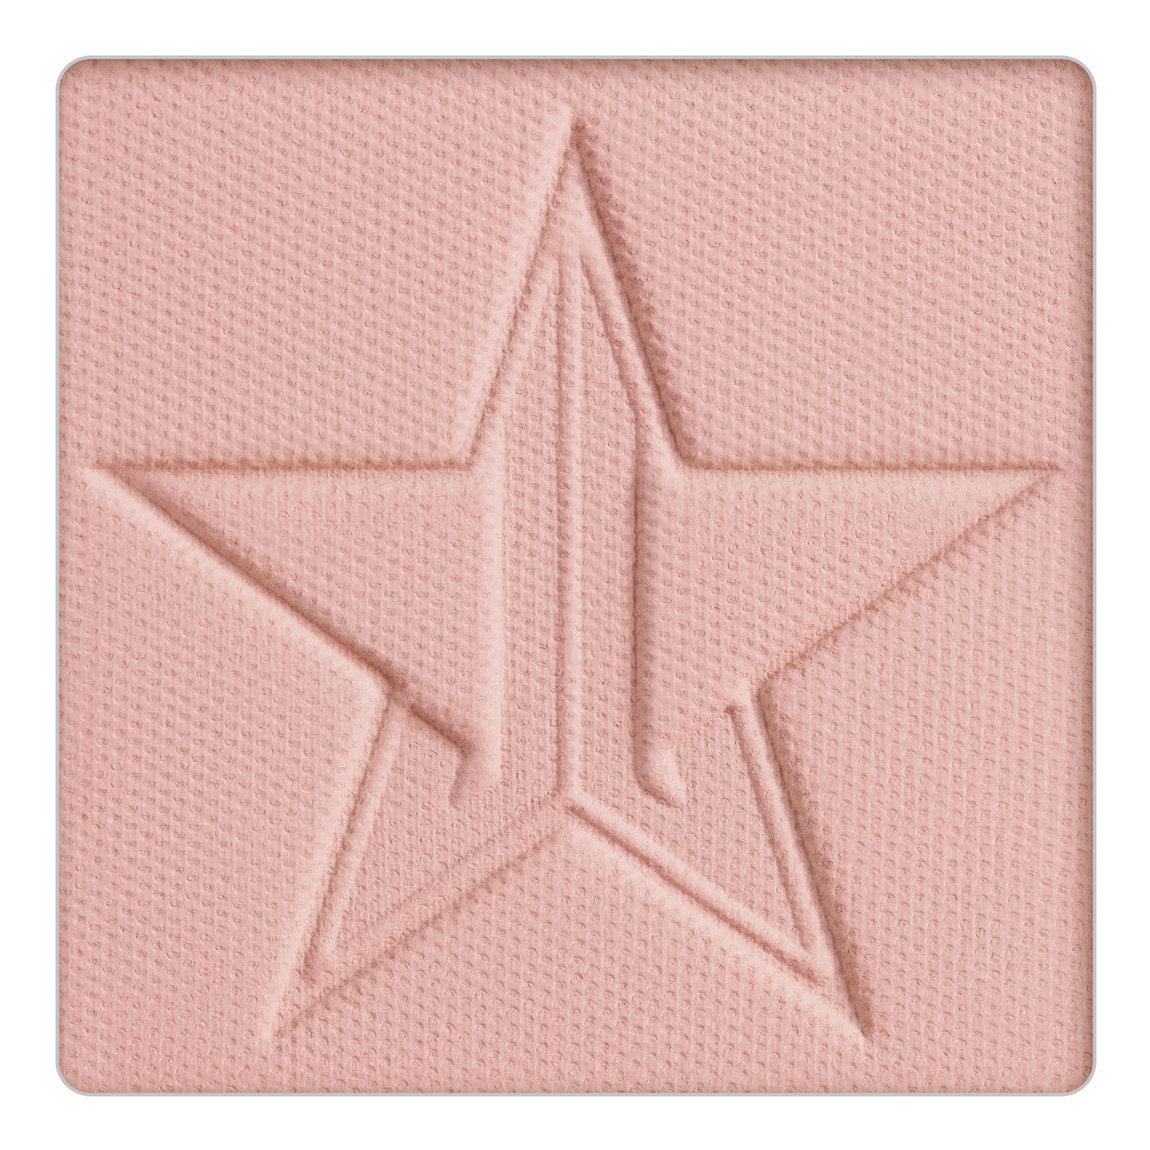 Jeffree Star Cosmetics Artistry Singles Sugarcane alternative view 1.